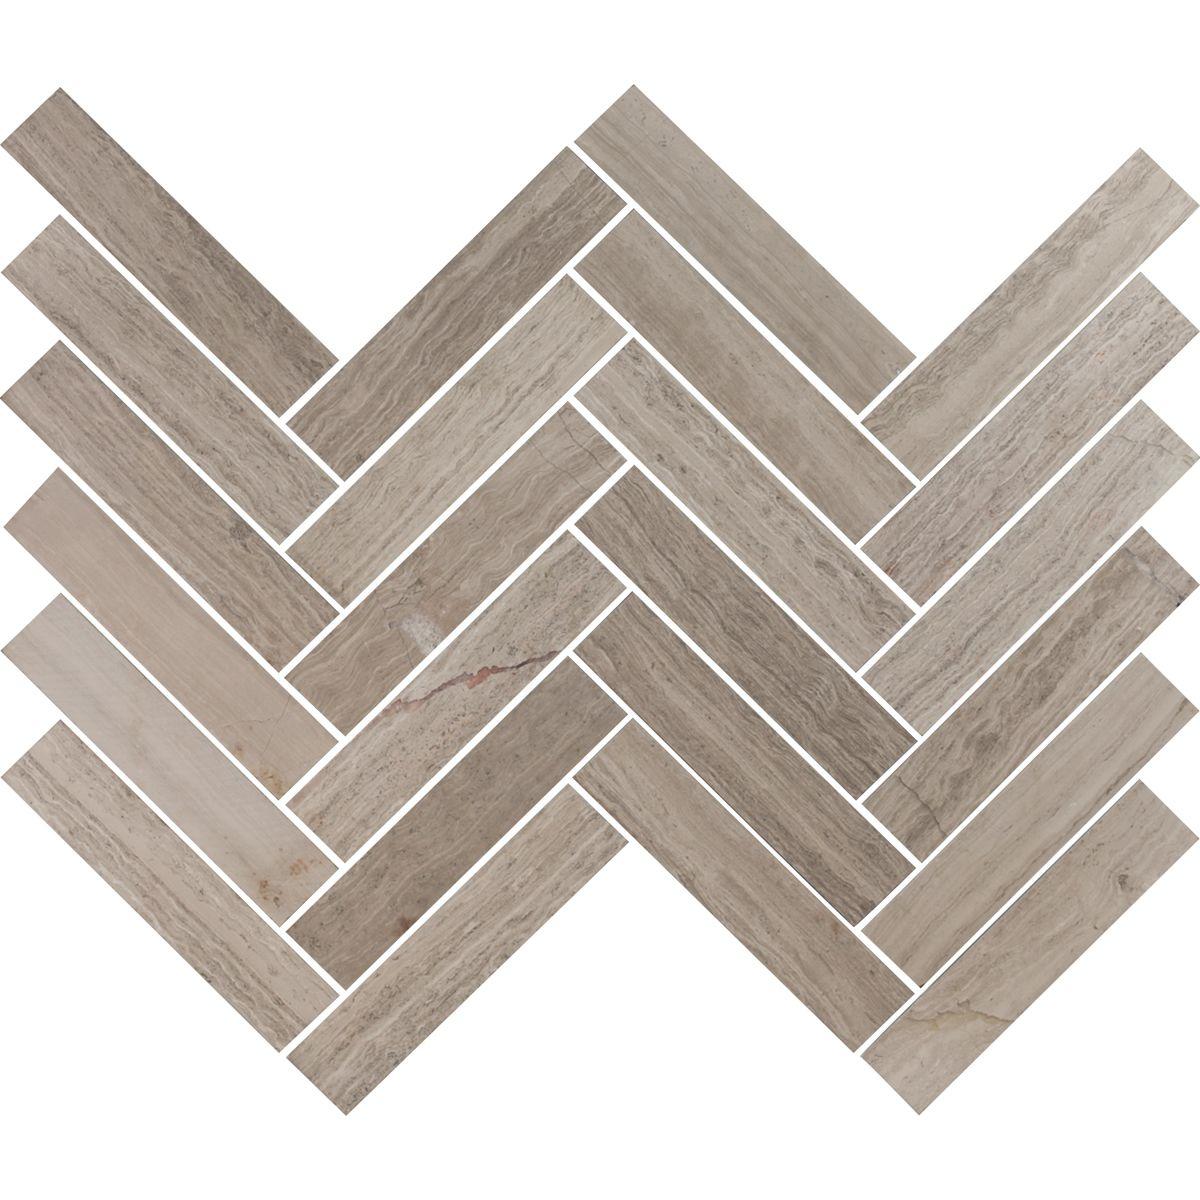 gray and white herringbone tile floors sessemo stone. Black Bedroom Furniture Sets. Home Design Ideas